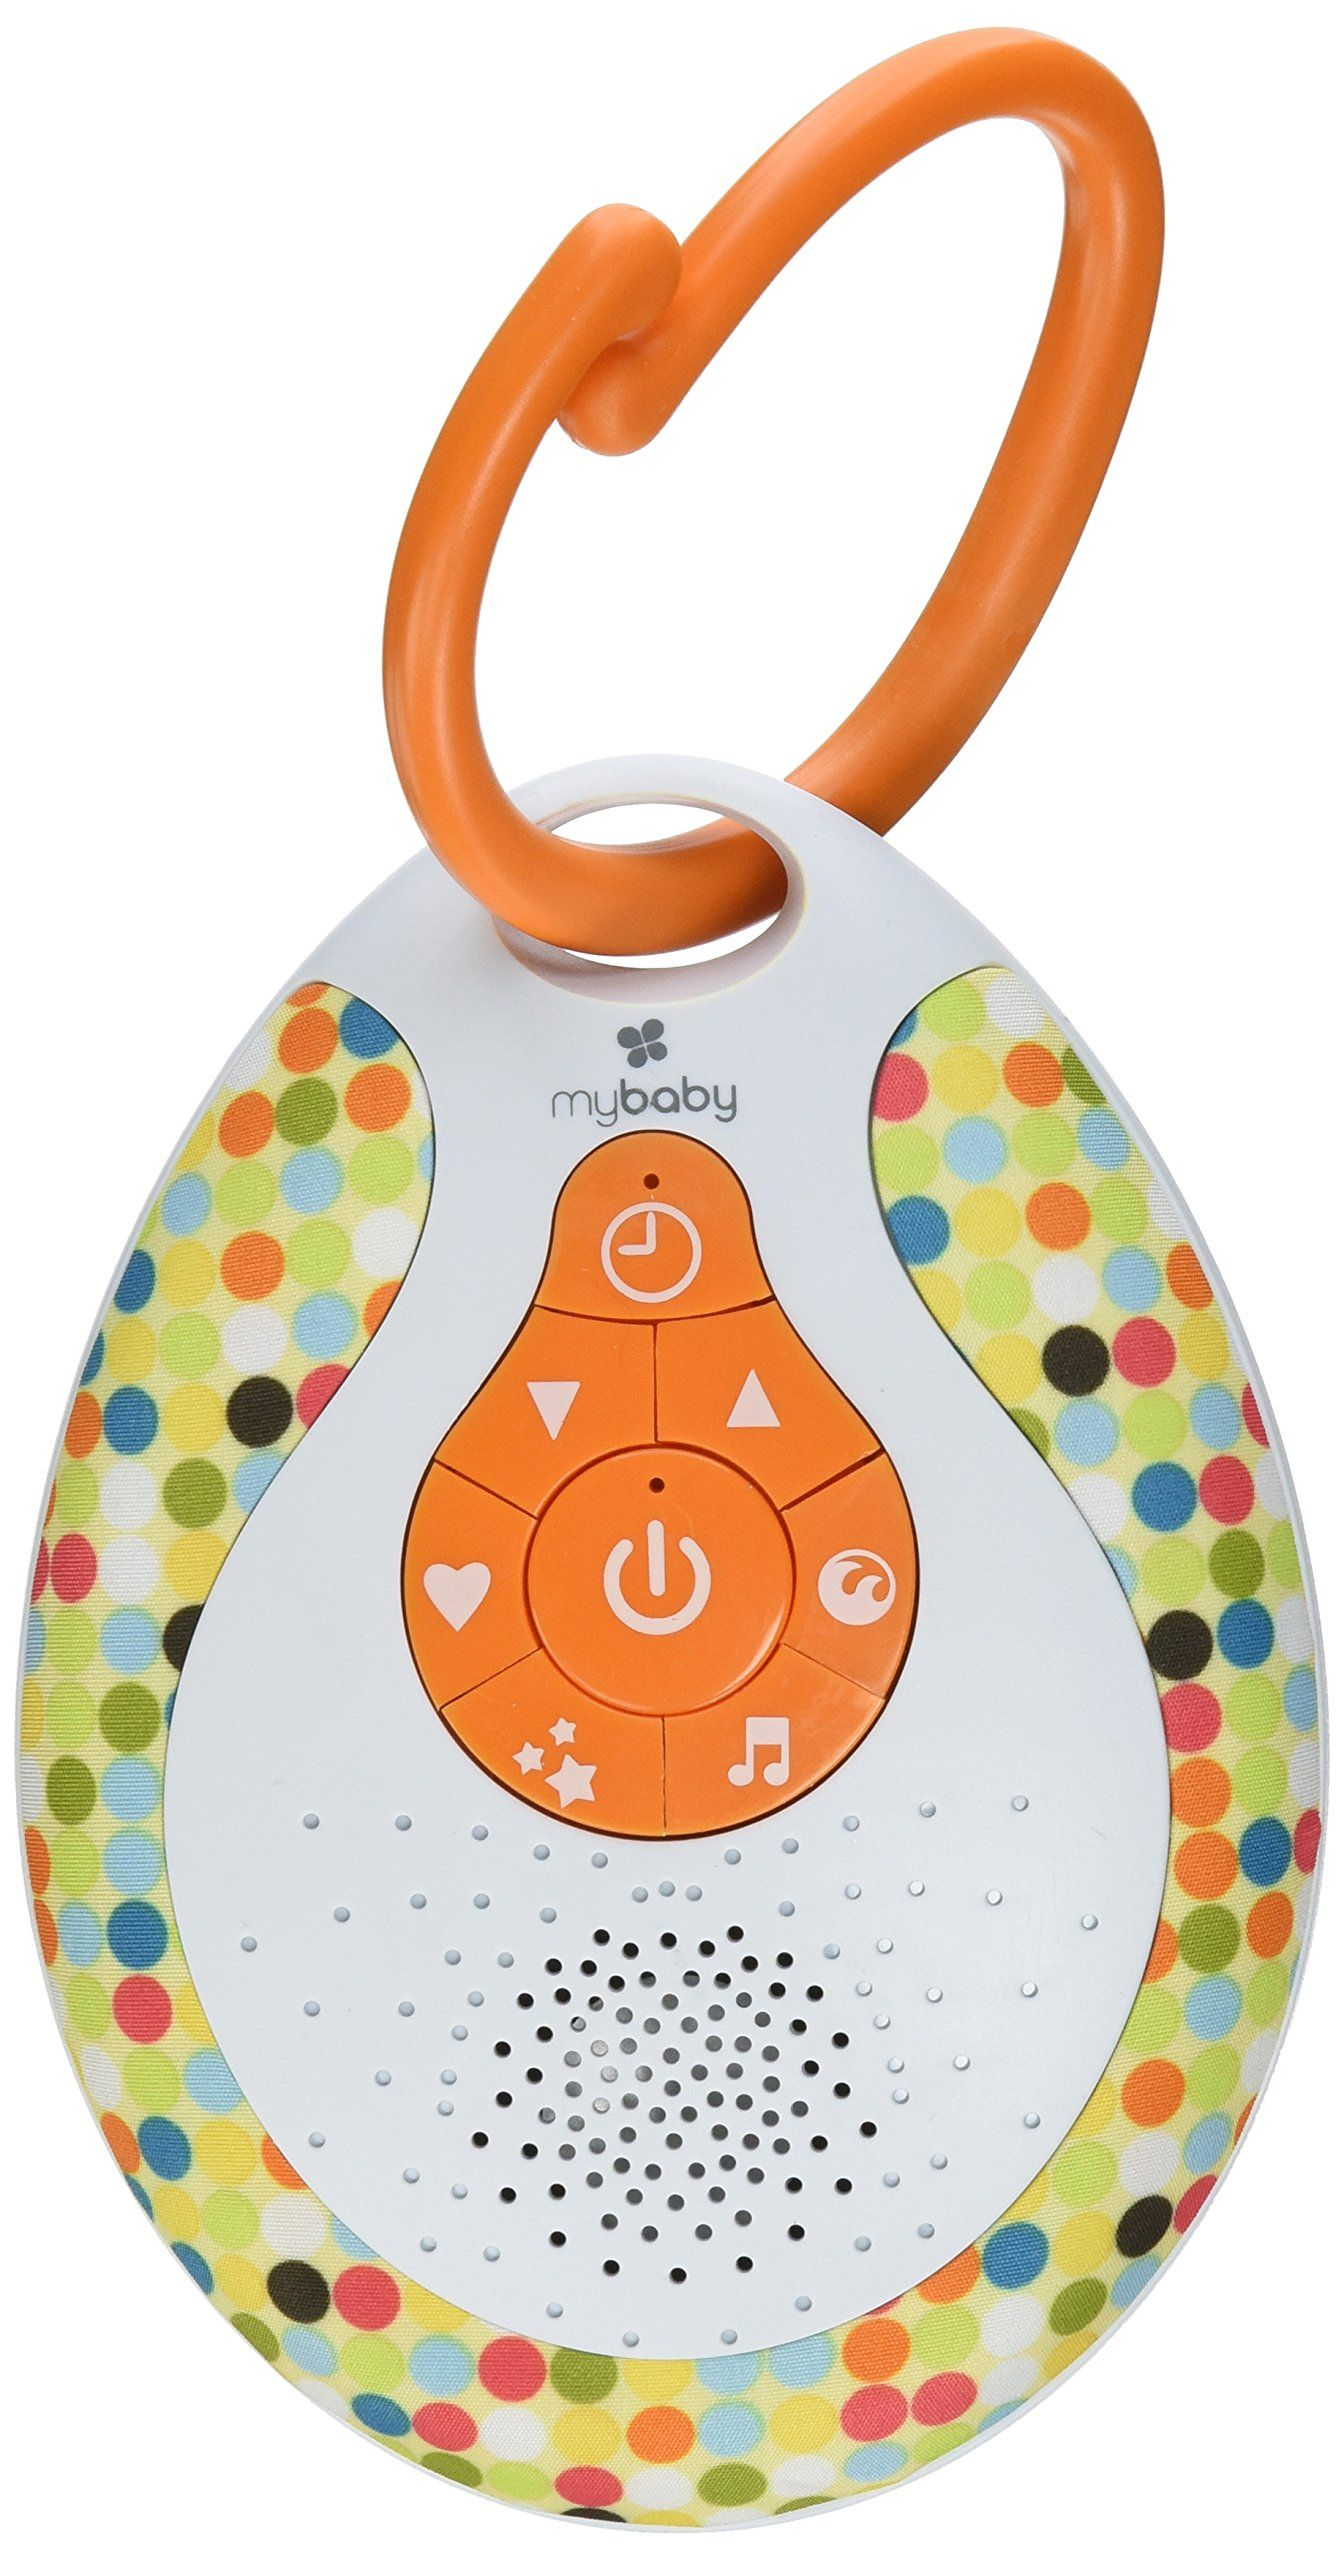 Baby cribs tulsa - Mybaby Homedics Soundspa On The Go Tulsa Pediatric Sleep Consulting